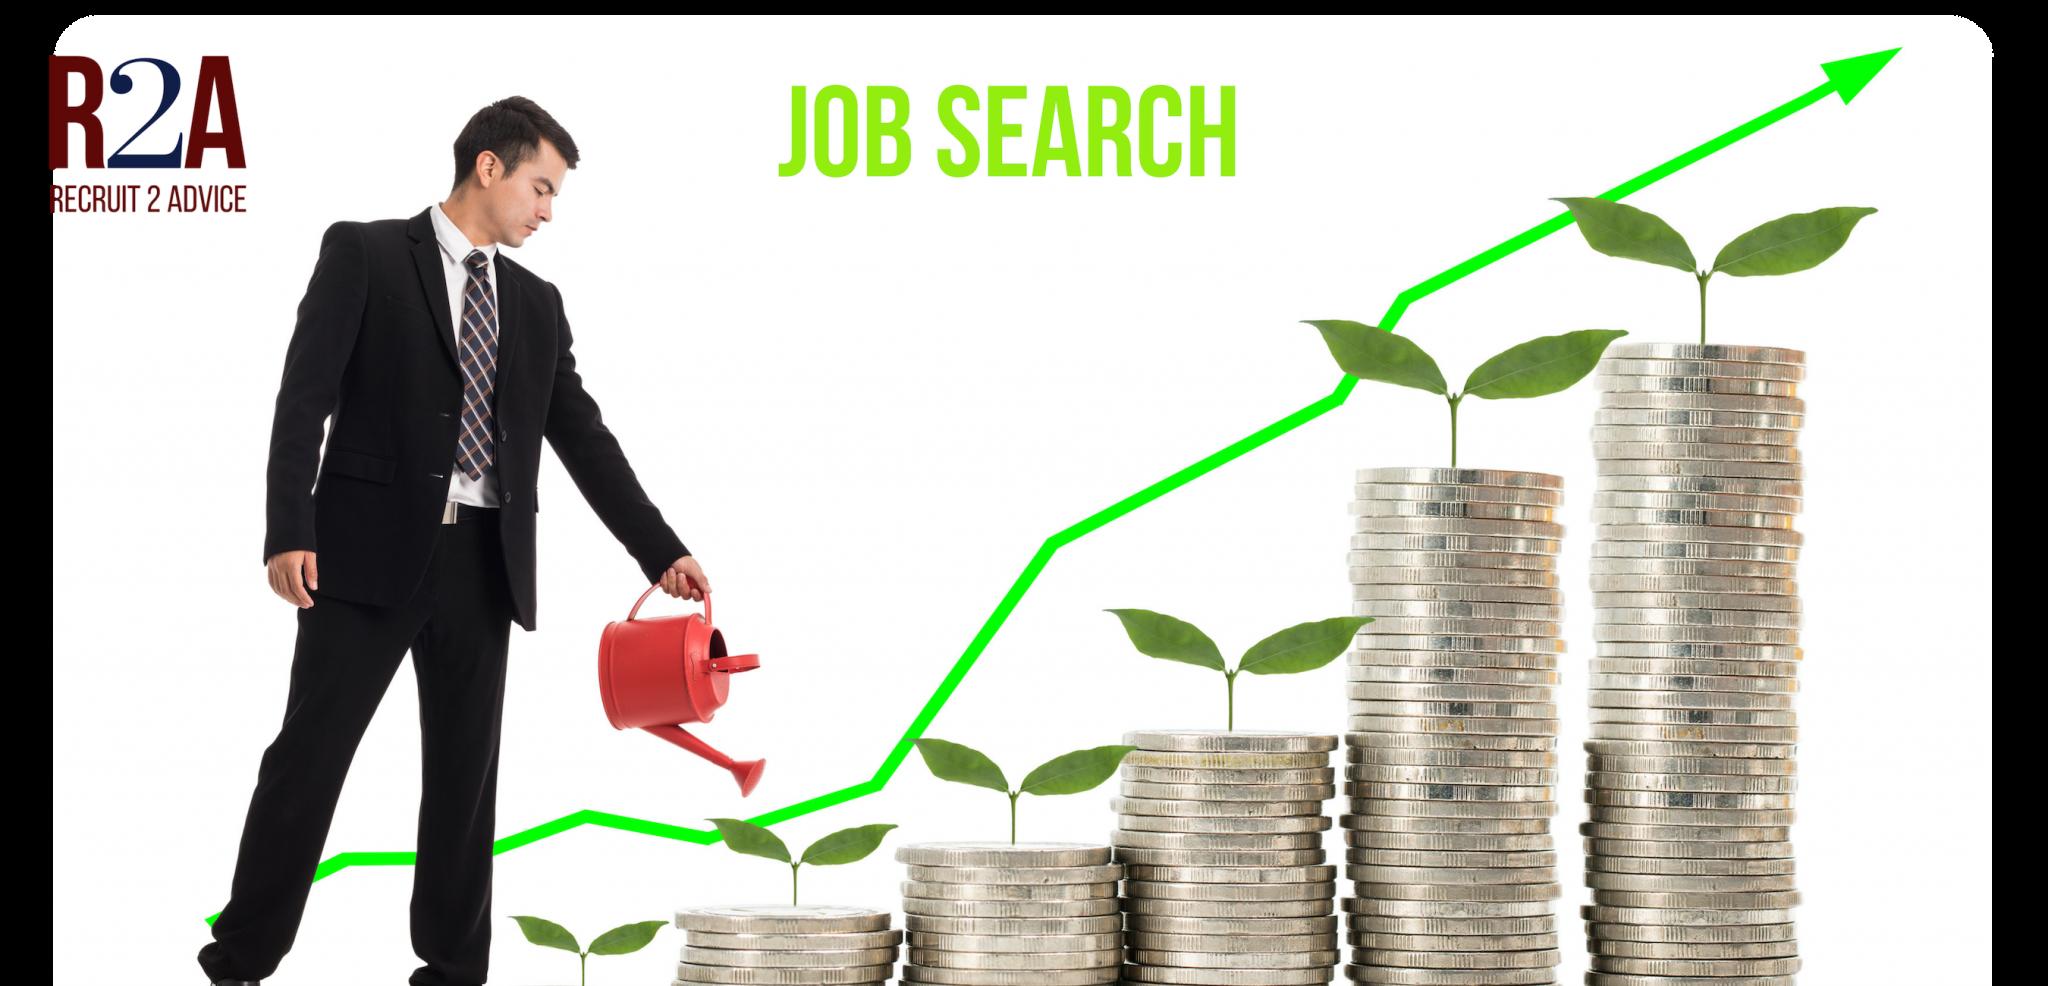 Recruit 2 Advice – FPA – Financial Planning Australia – Recruitment - Careers - Jobs